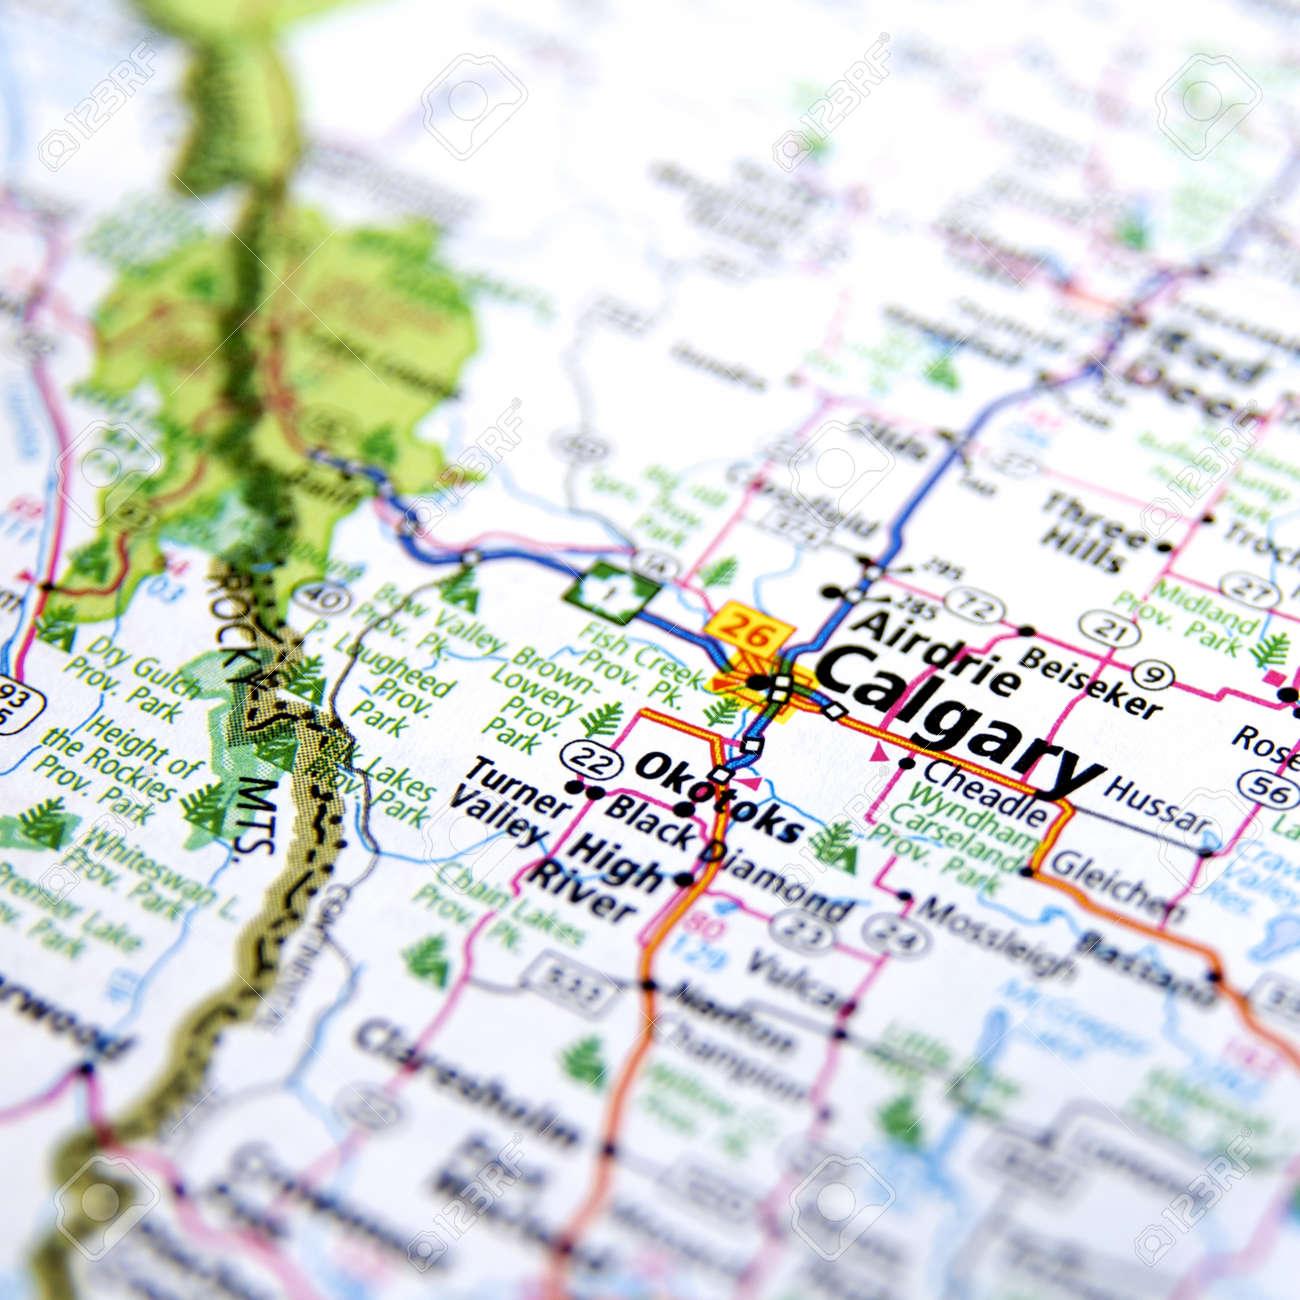 Map Of Canada Calgary.Close Up Map Of Calgary Canada